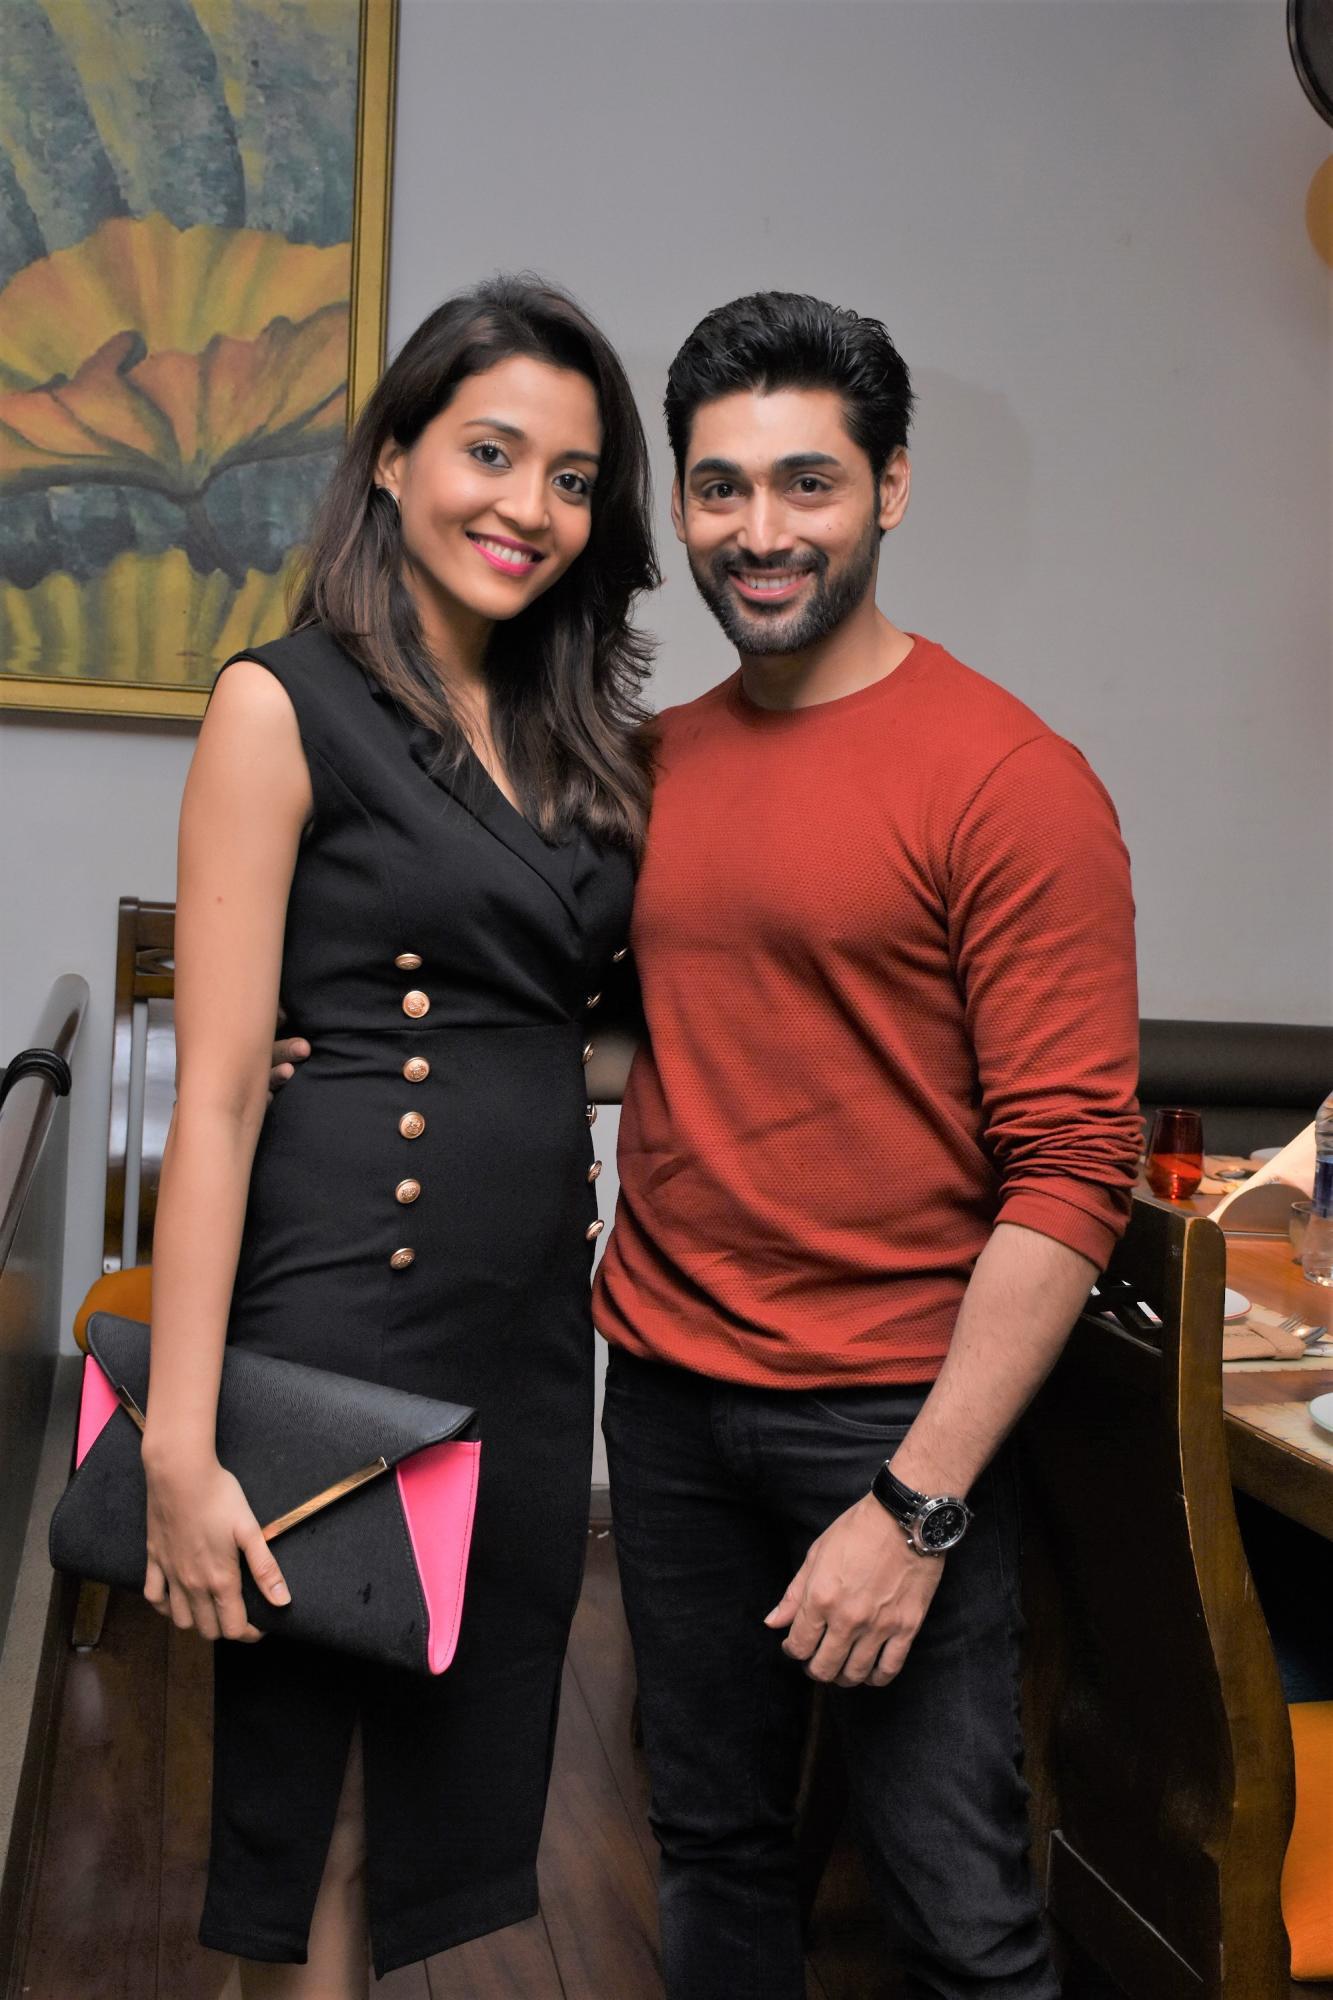 Munisha Khatwani's Boyfriend Proposes to Her At her Birthday Bash!